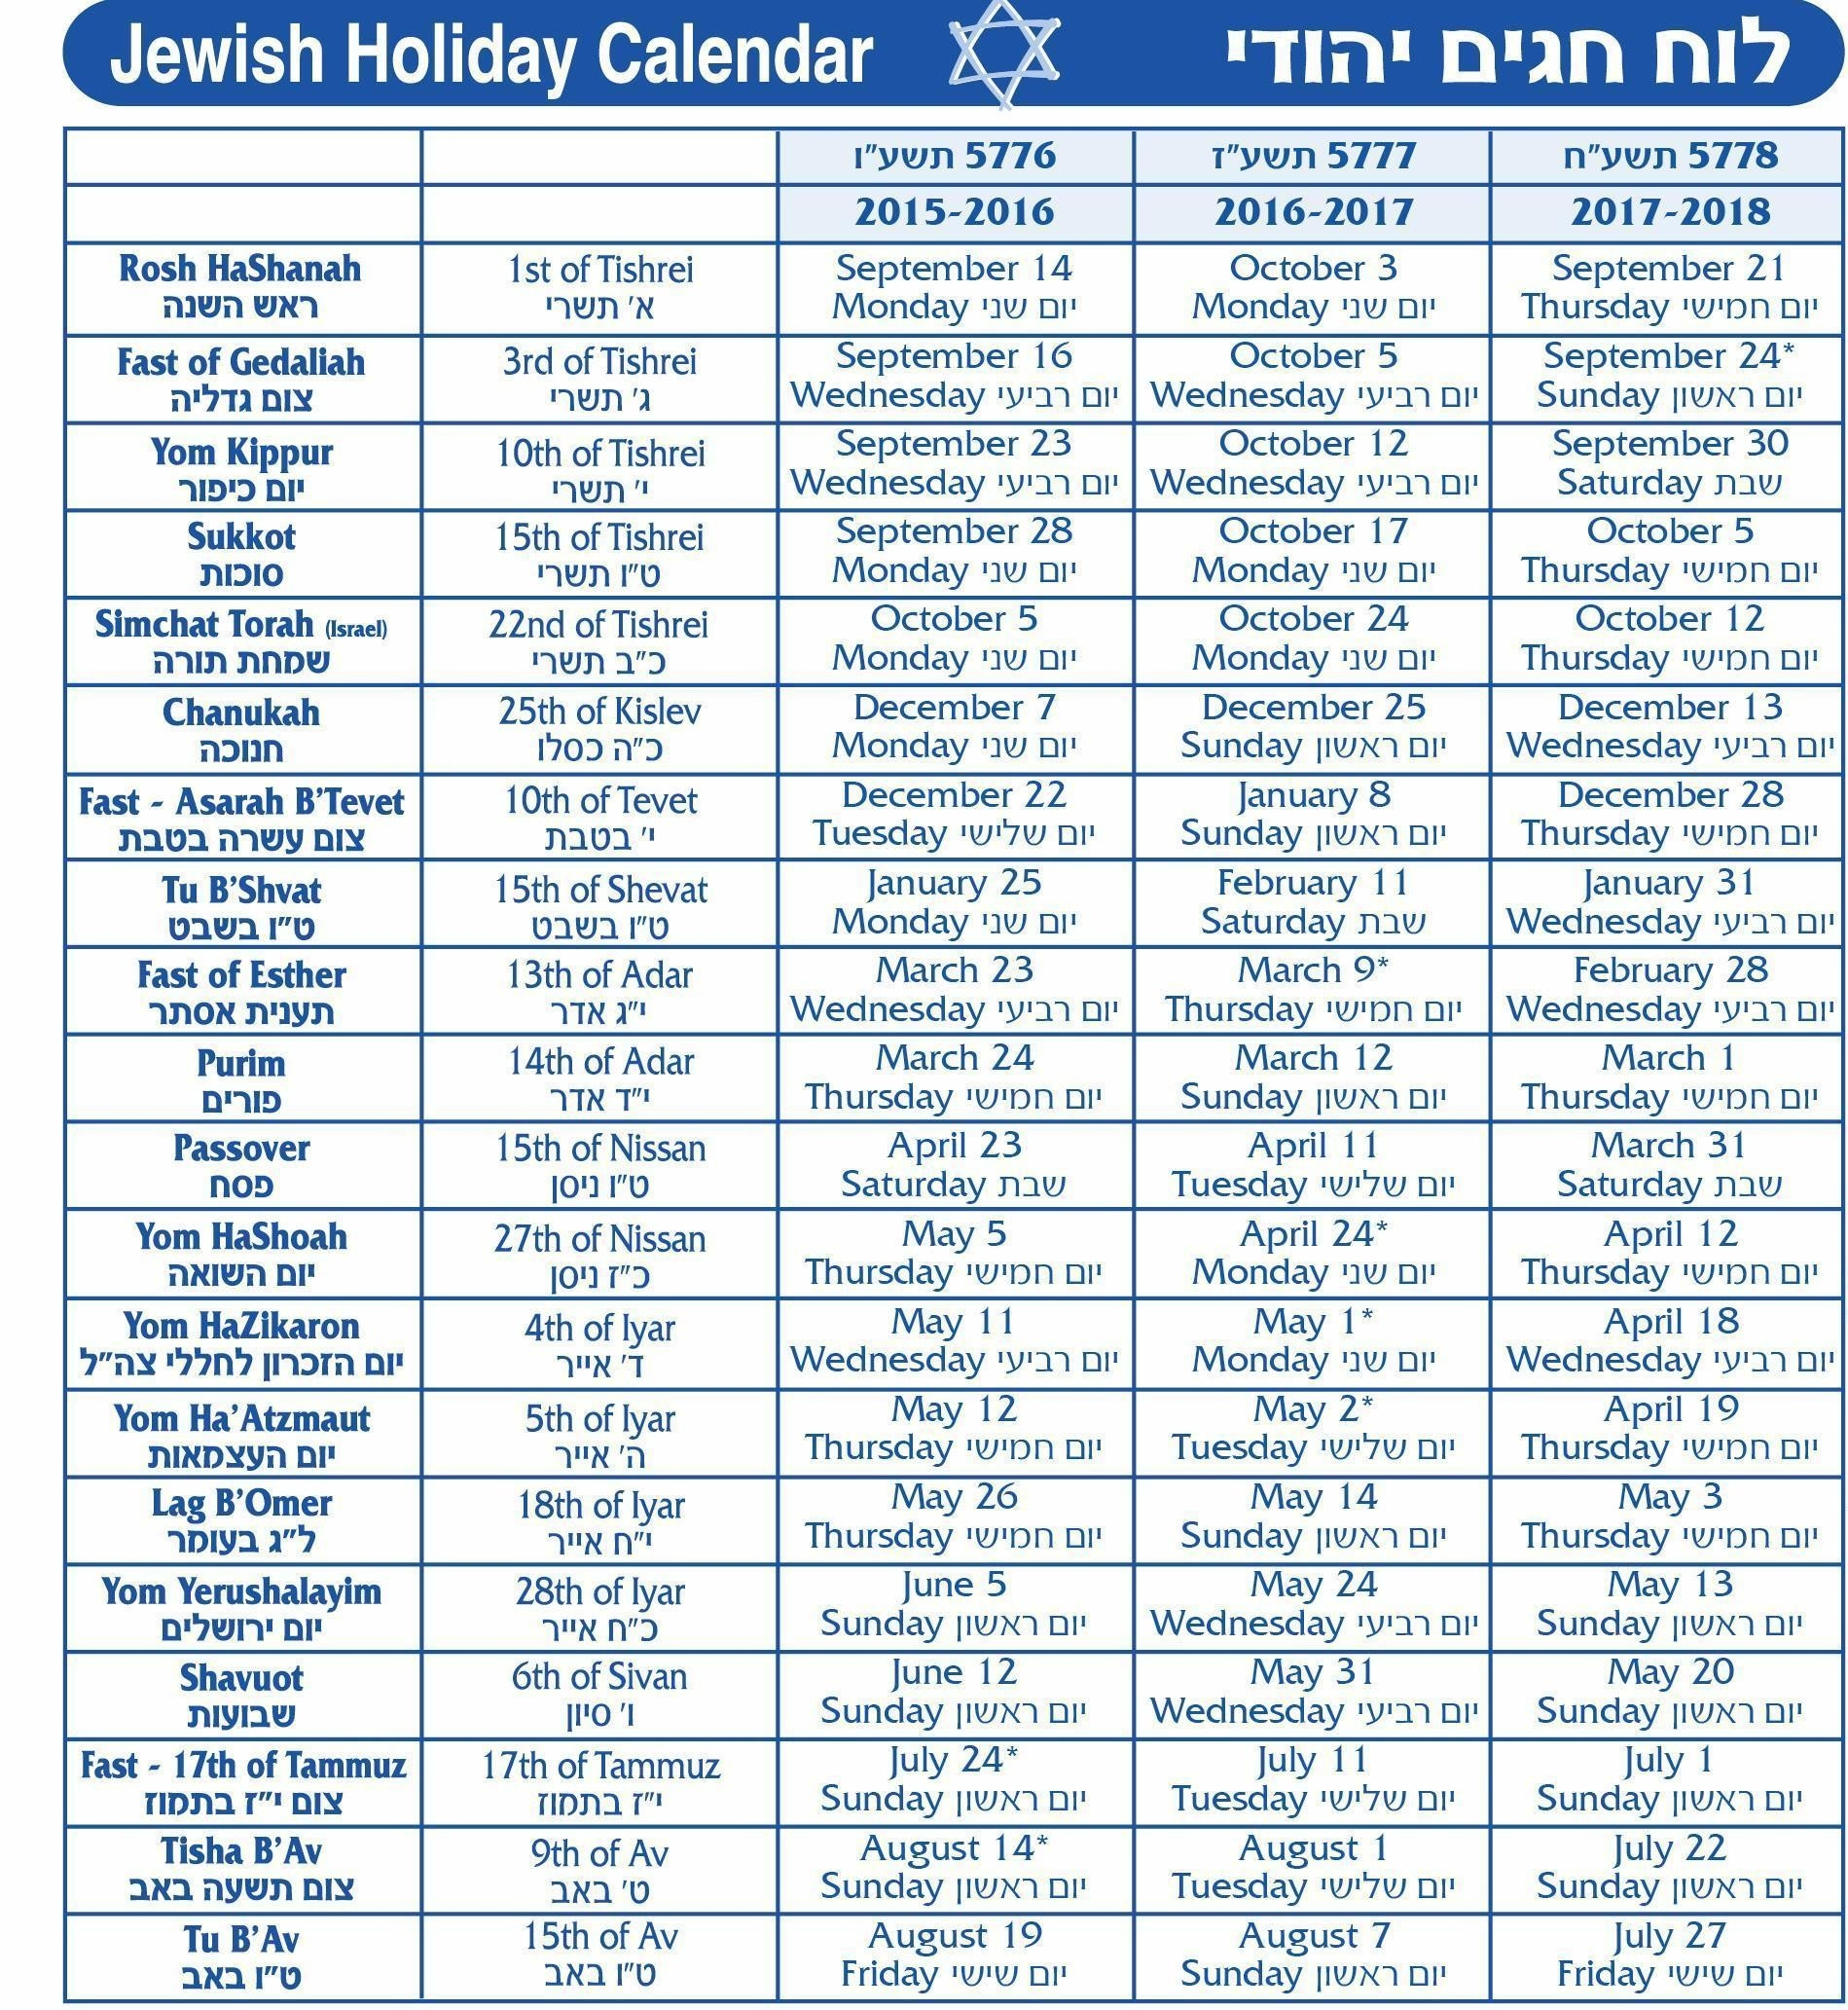 2018 Holiday Calendar - Usa, Federal, Jewish - Web E-Calendar Of Jewish Holidays